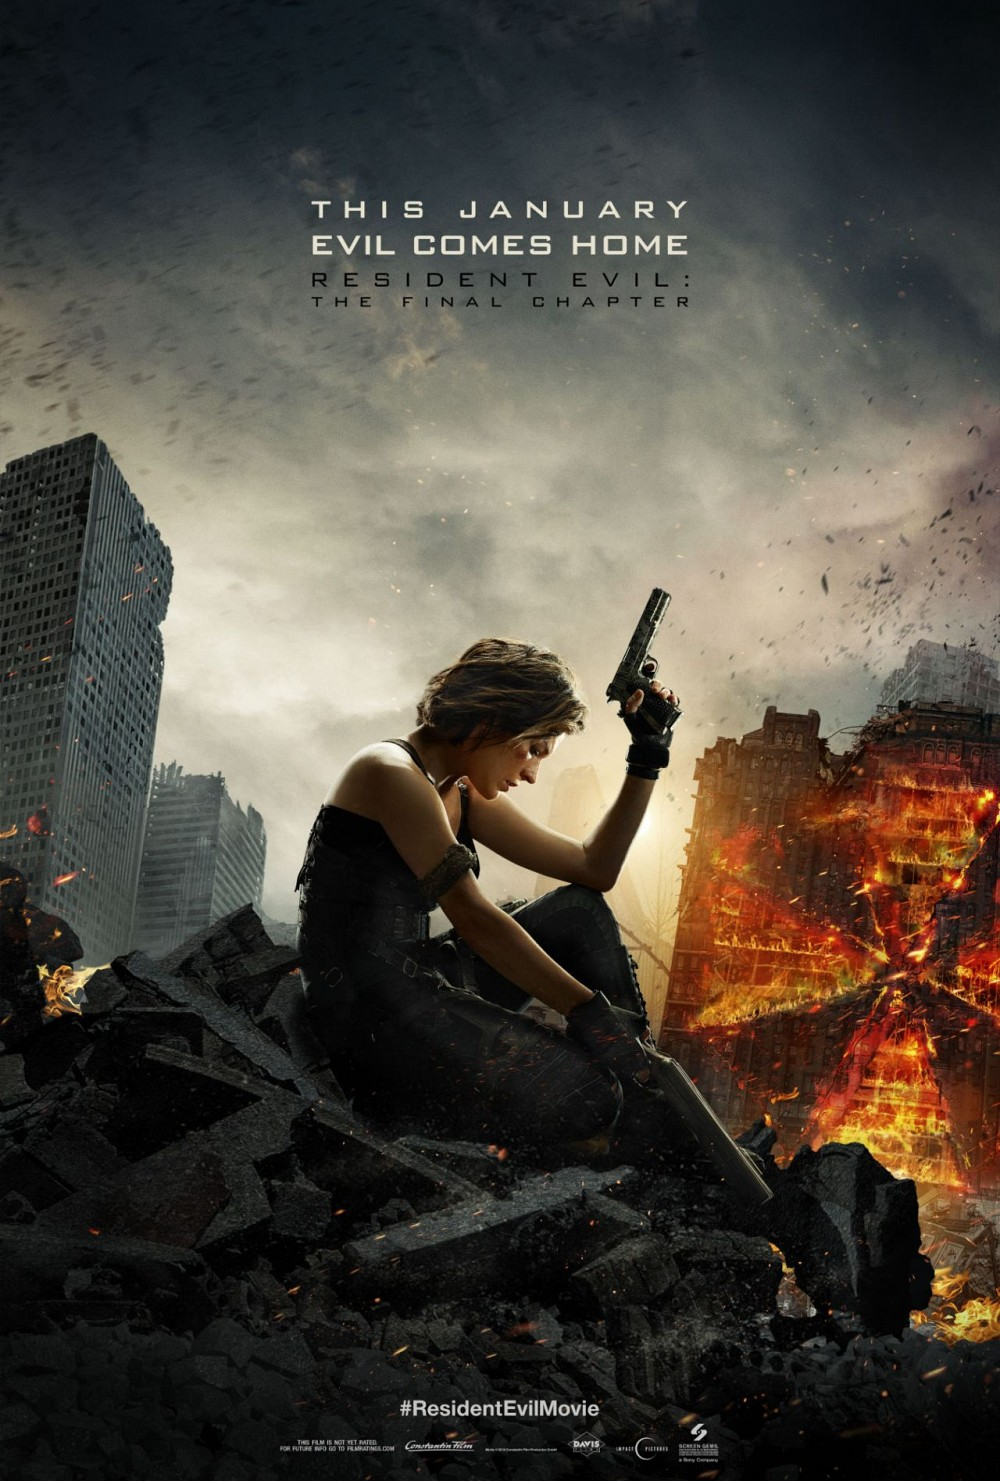 resident-evil-6-final-chapter-poster-2016